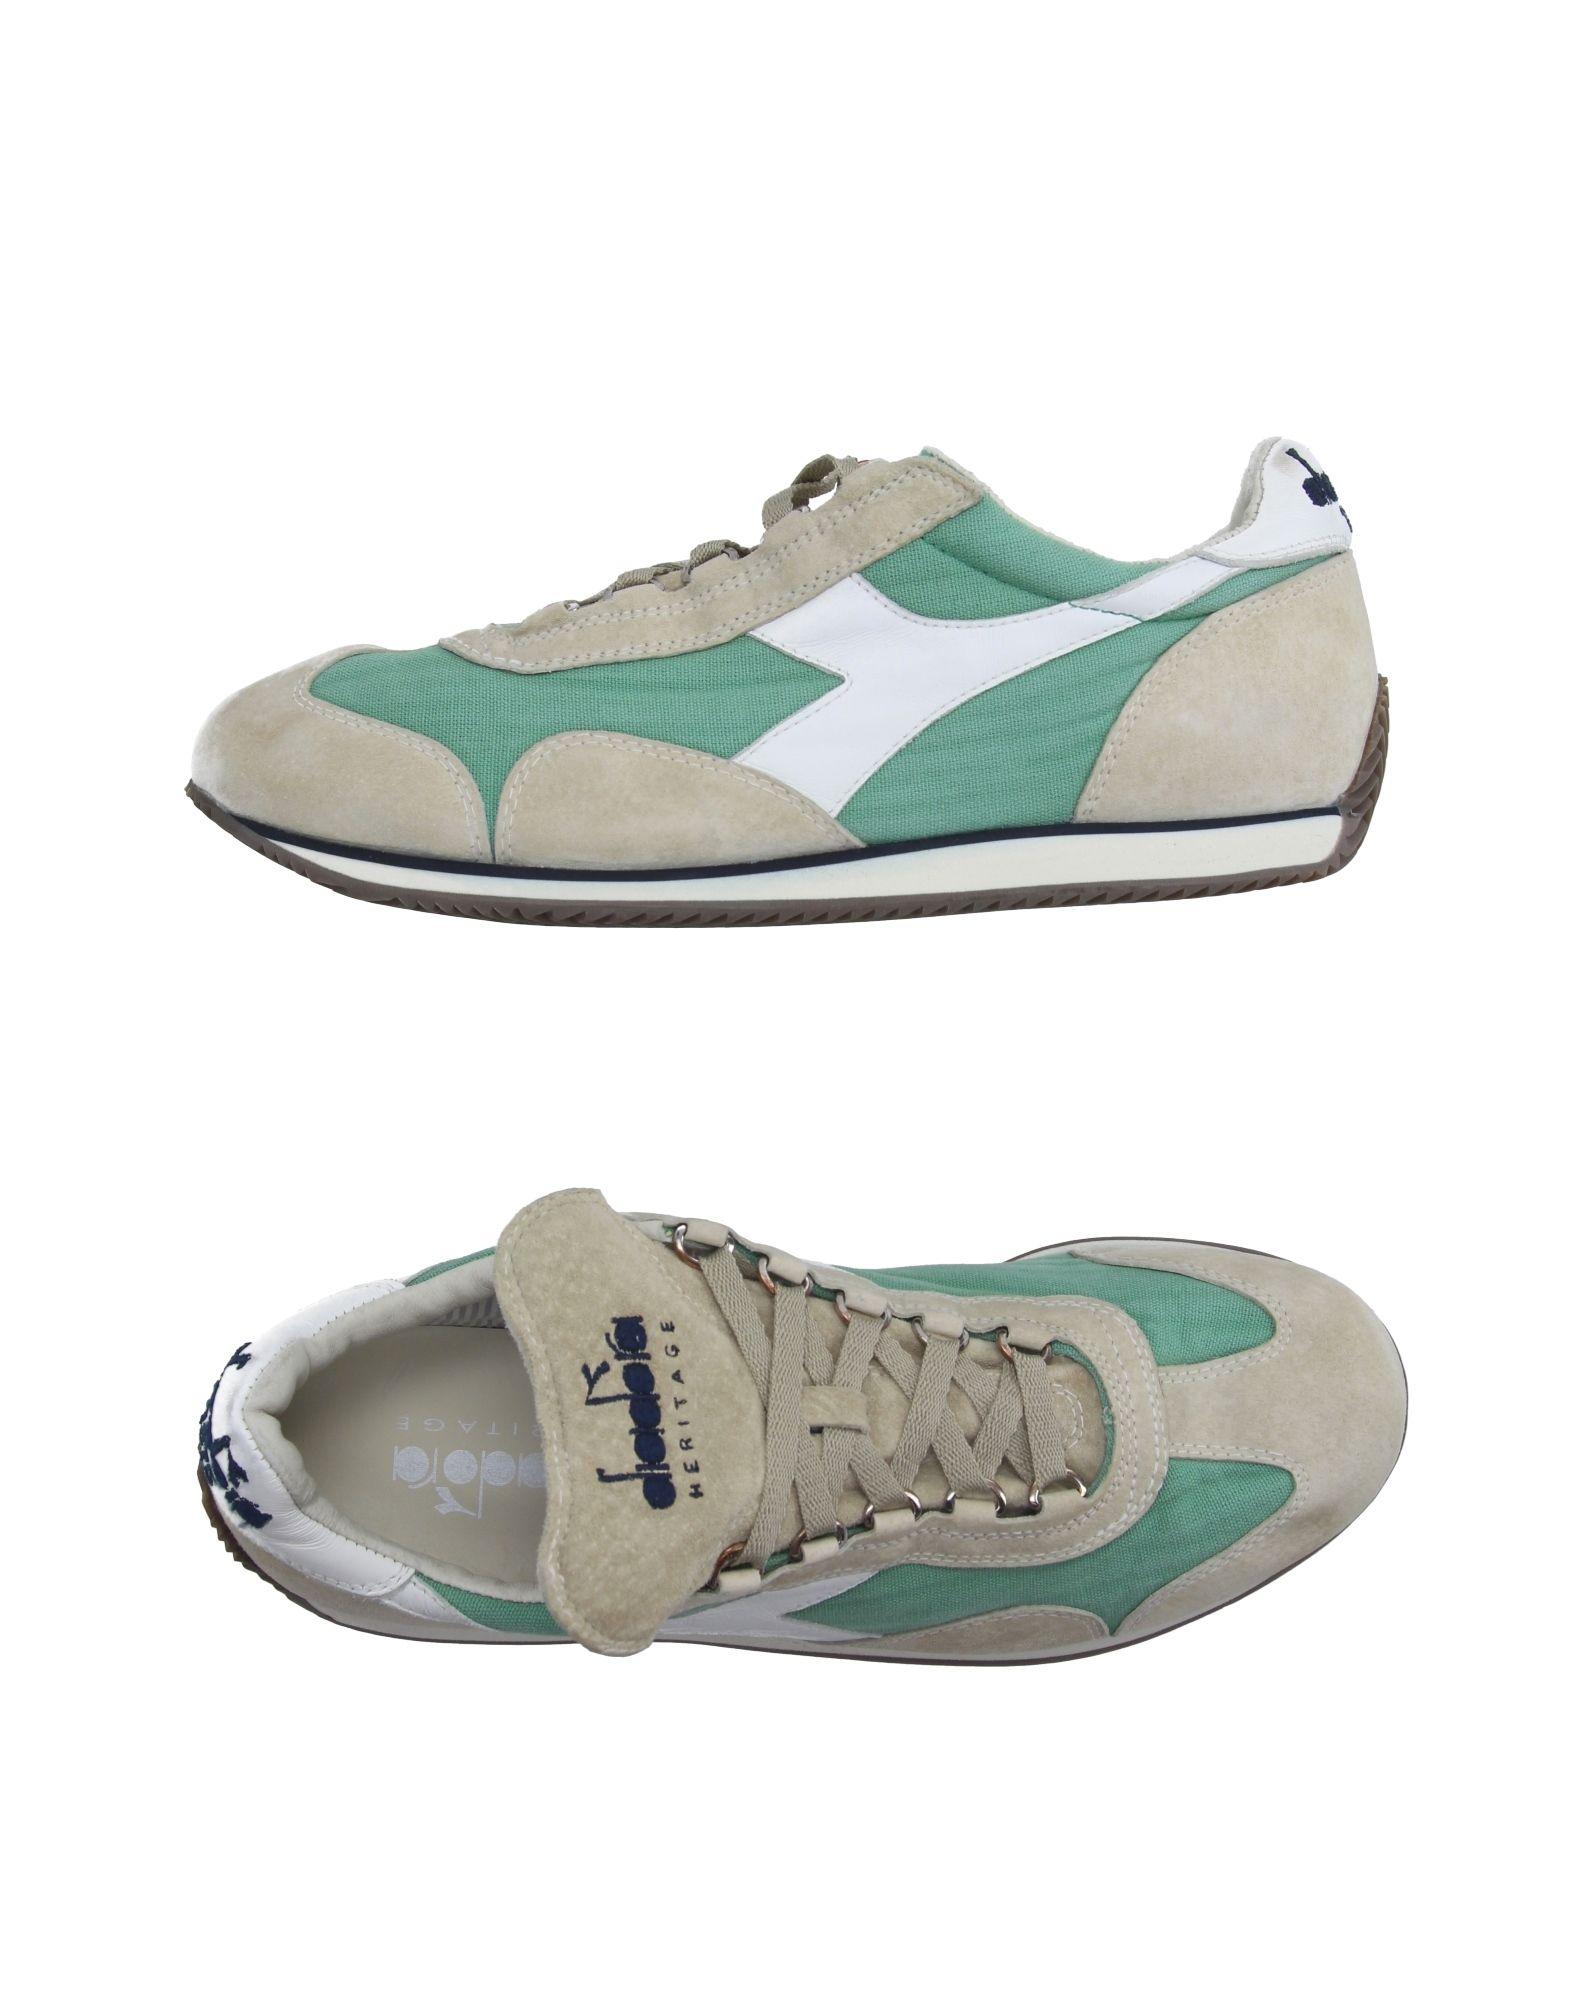 Diadora Heritage Heritage Sneakers - Men Diadora Heritage Heritage Sneakers online on  Australia - 44928170CH 151bd8